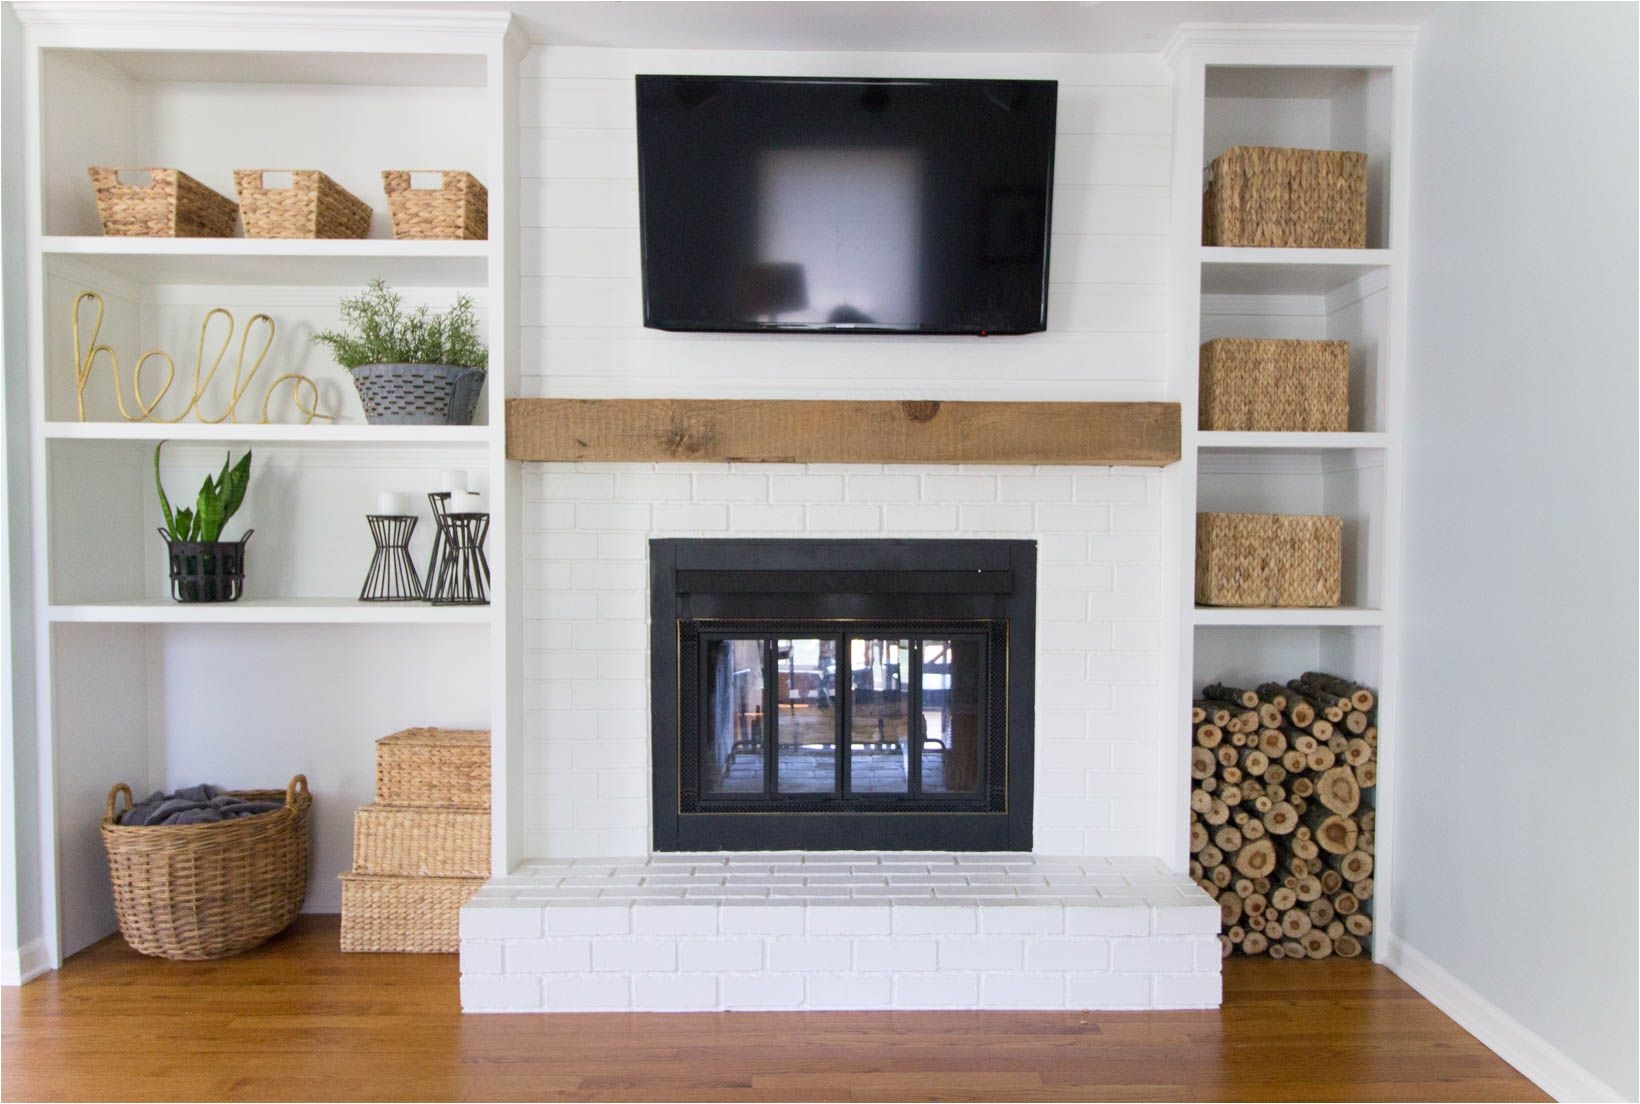 built in shelves around shallow depth brick fireplace